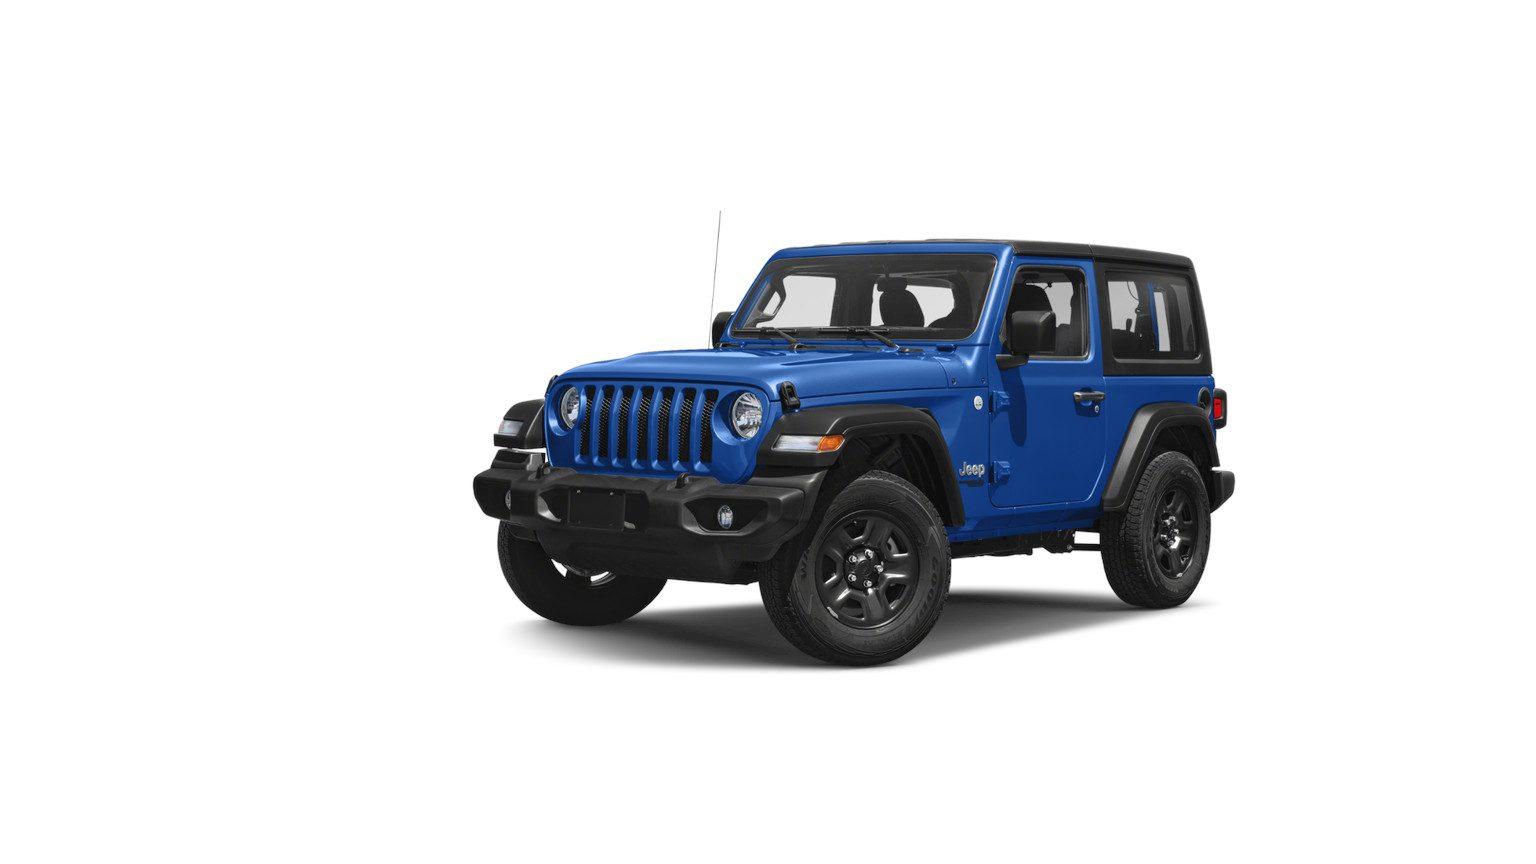 Jeep Wrangler insurance rates